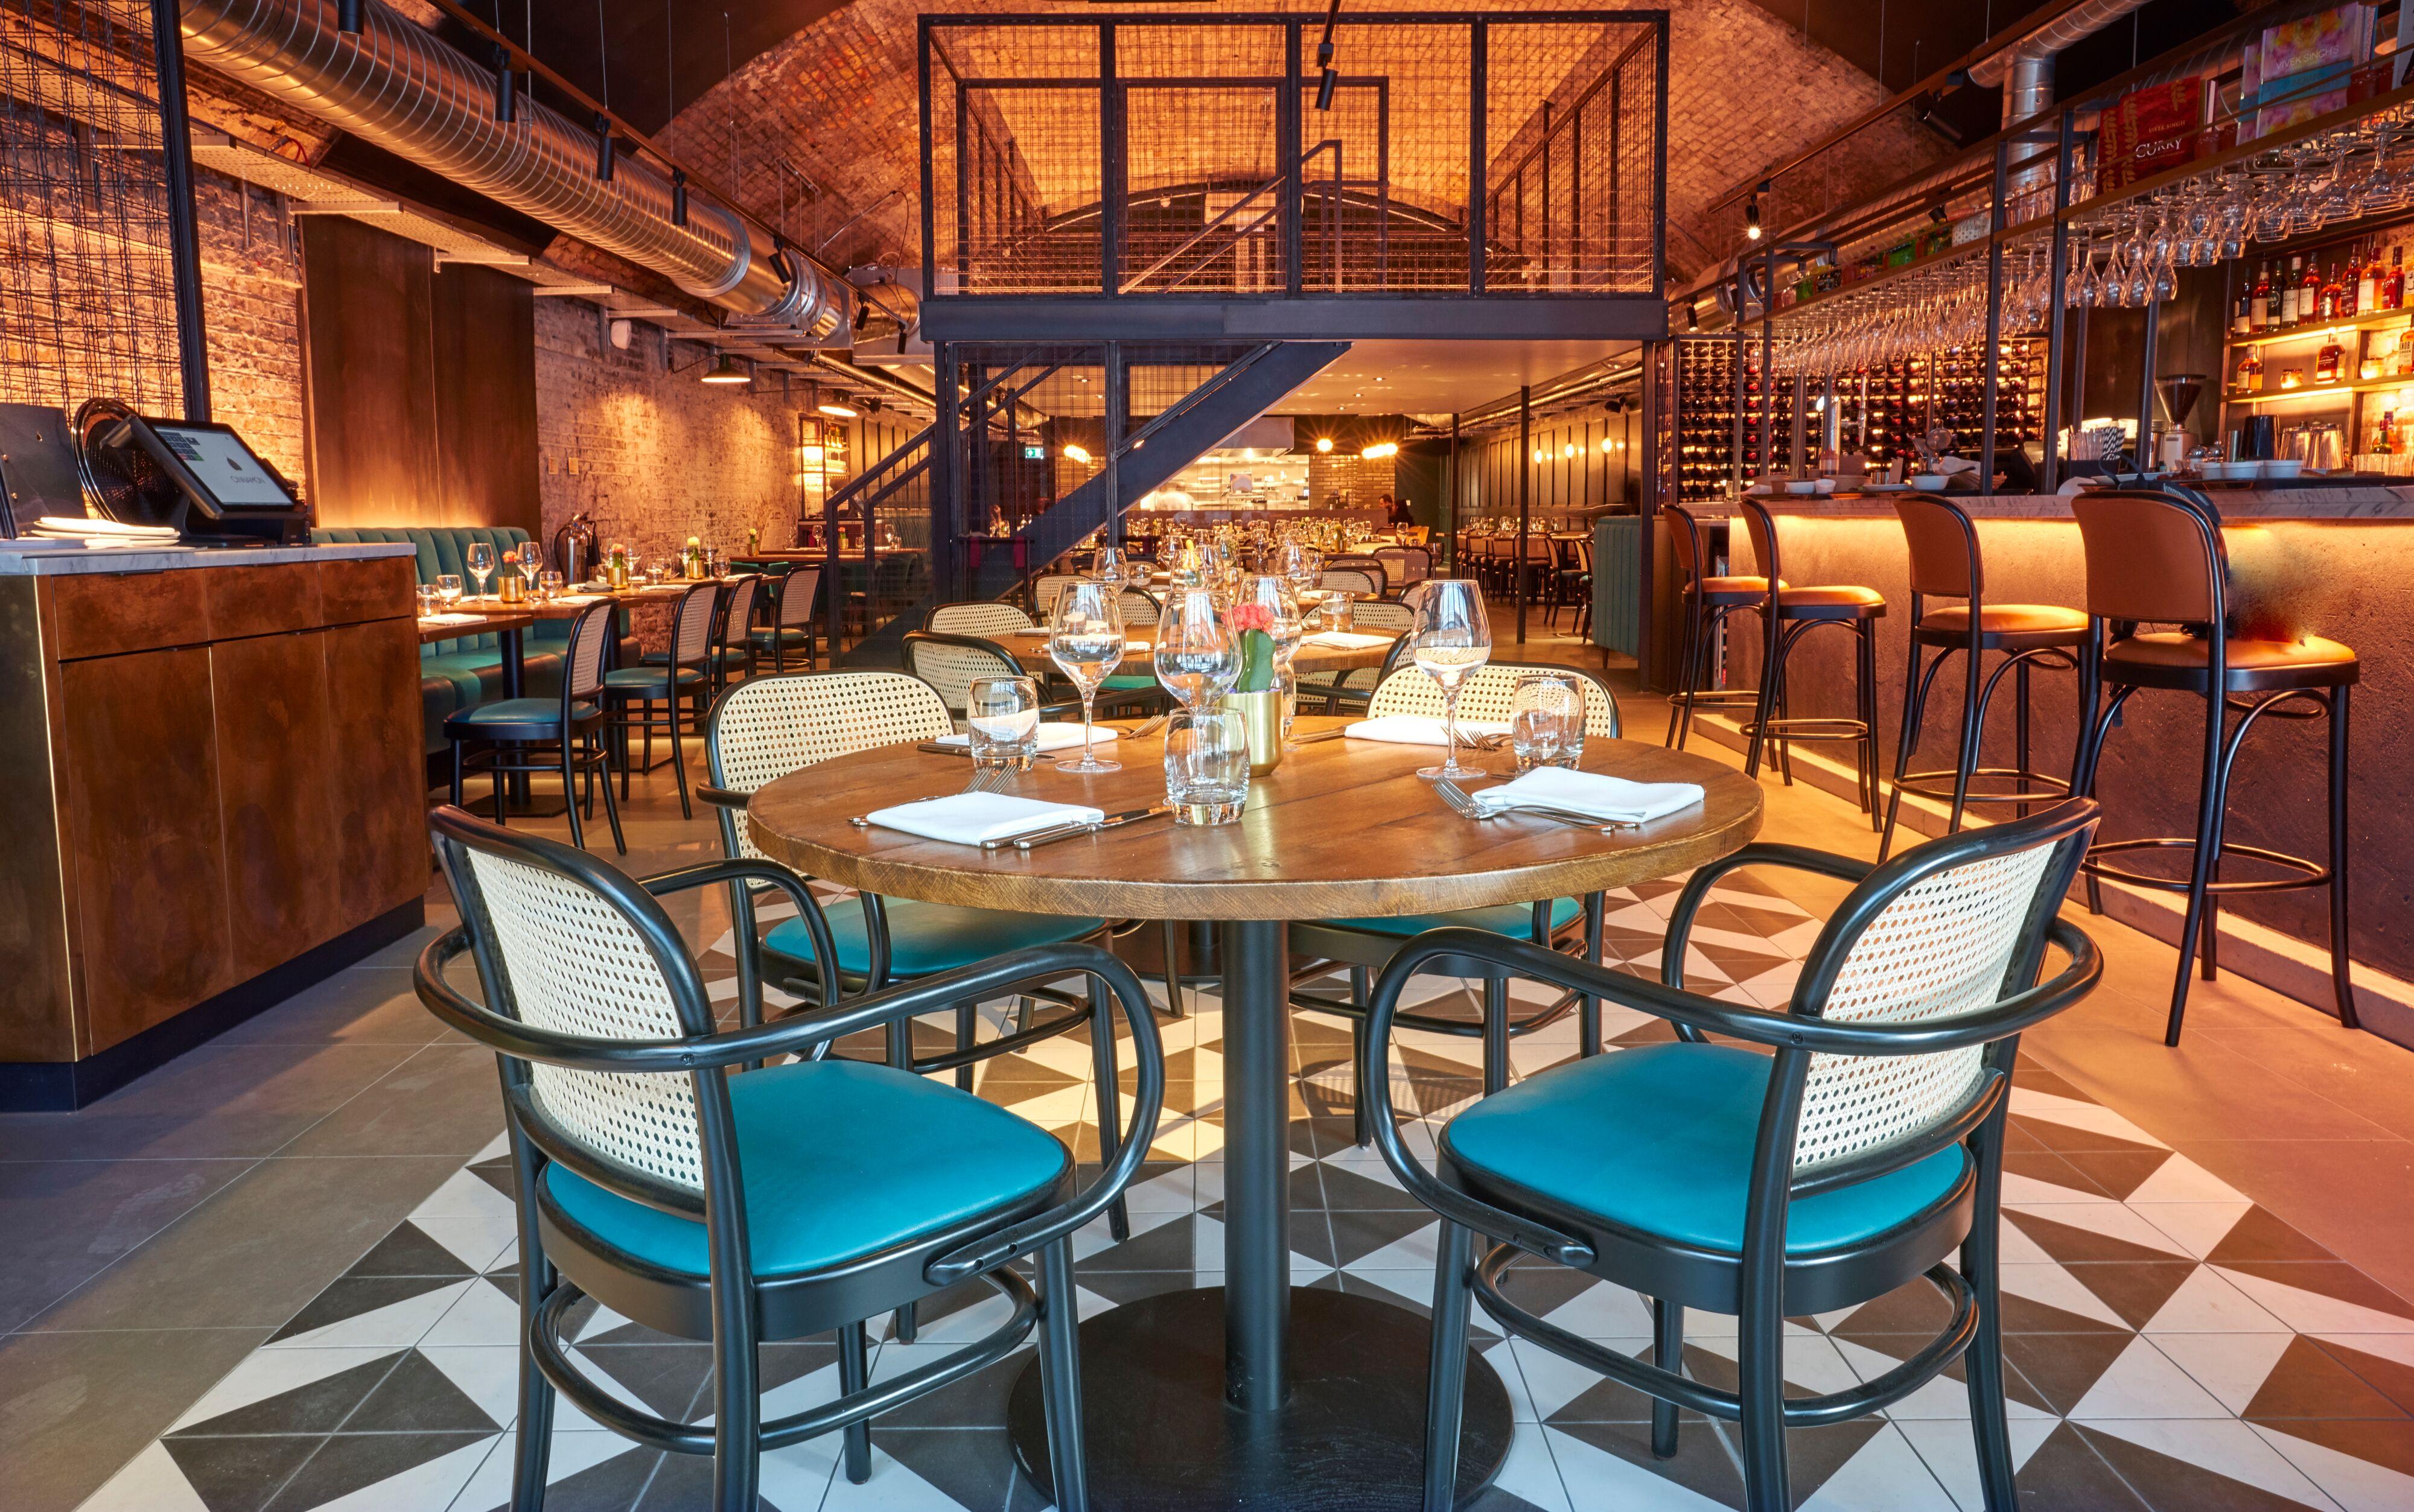 CK Battersea restaurant